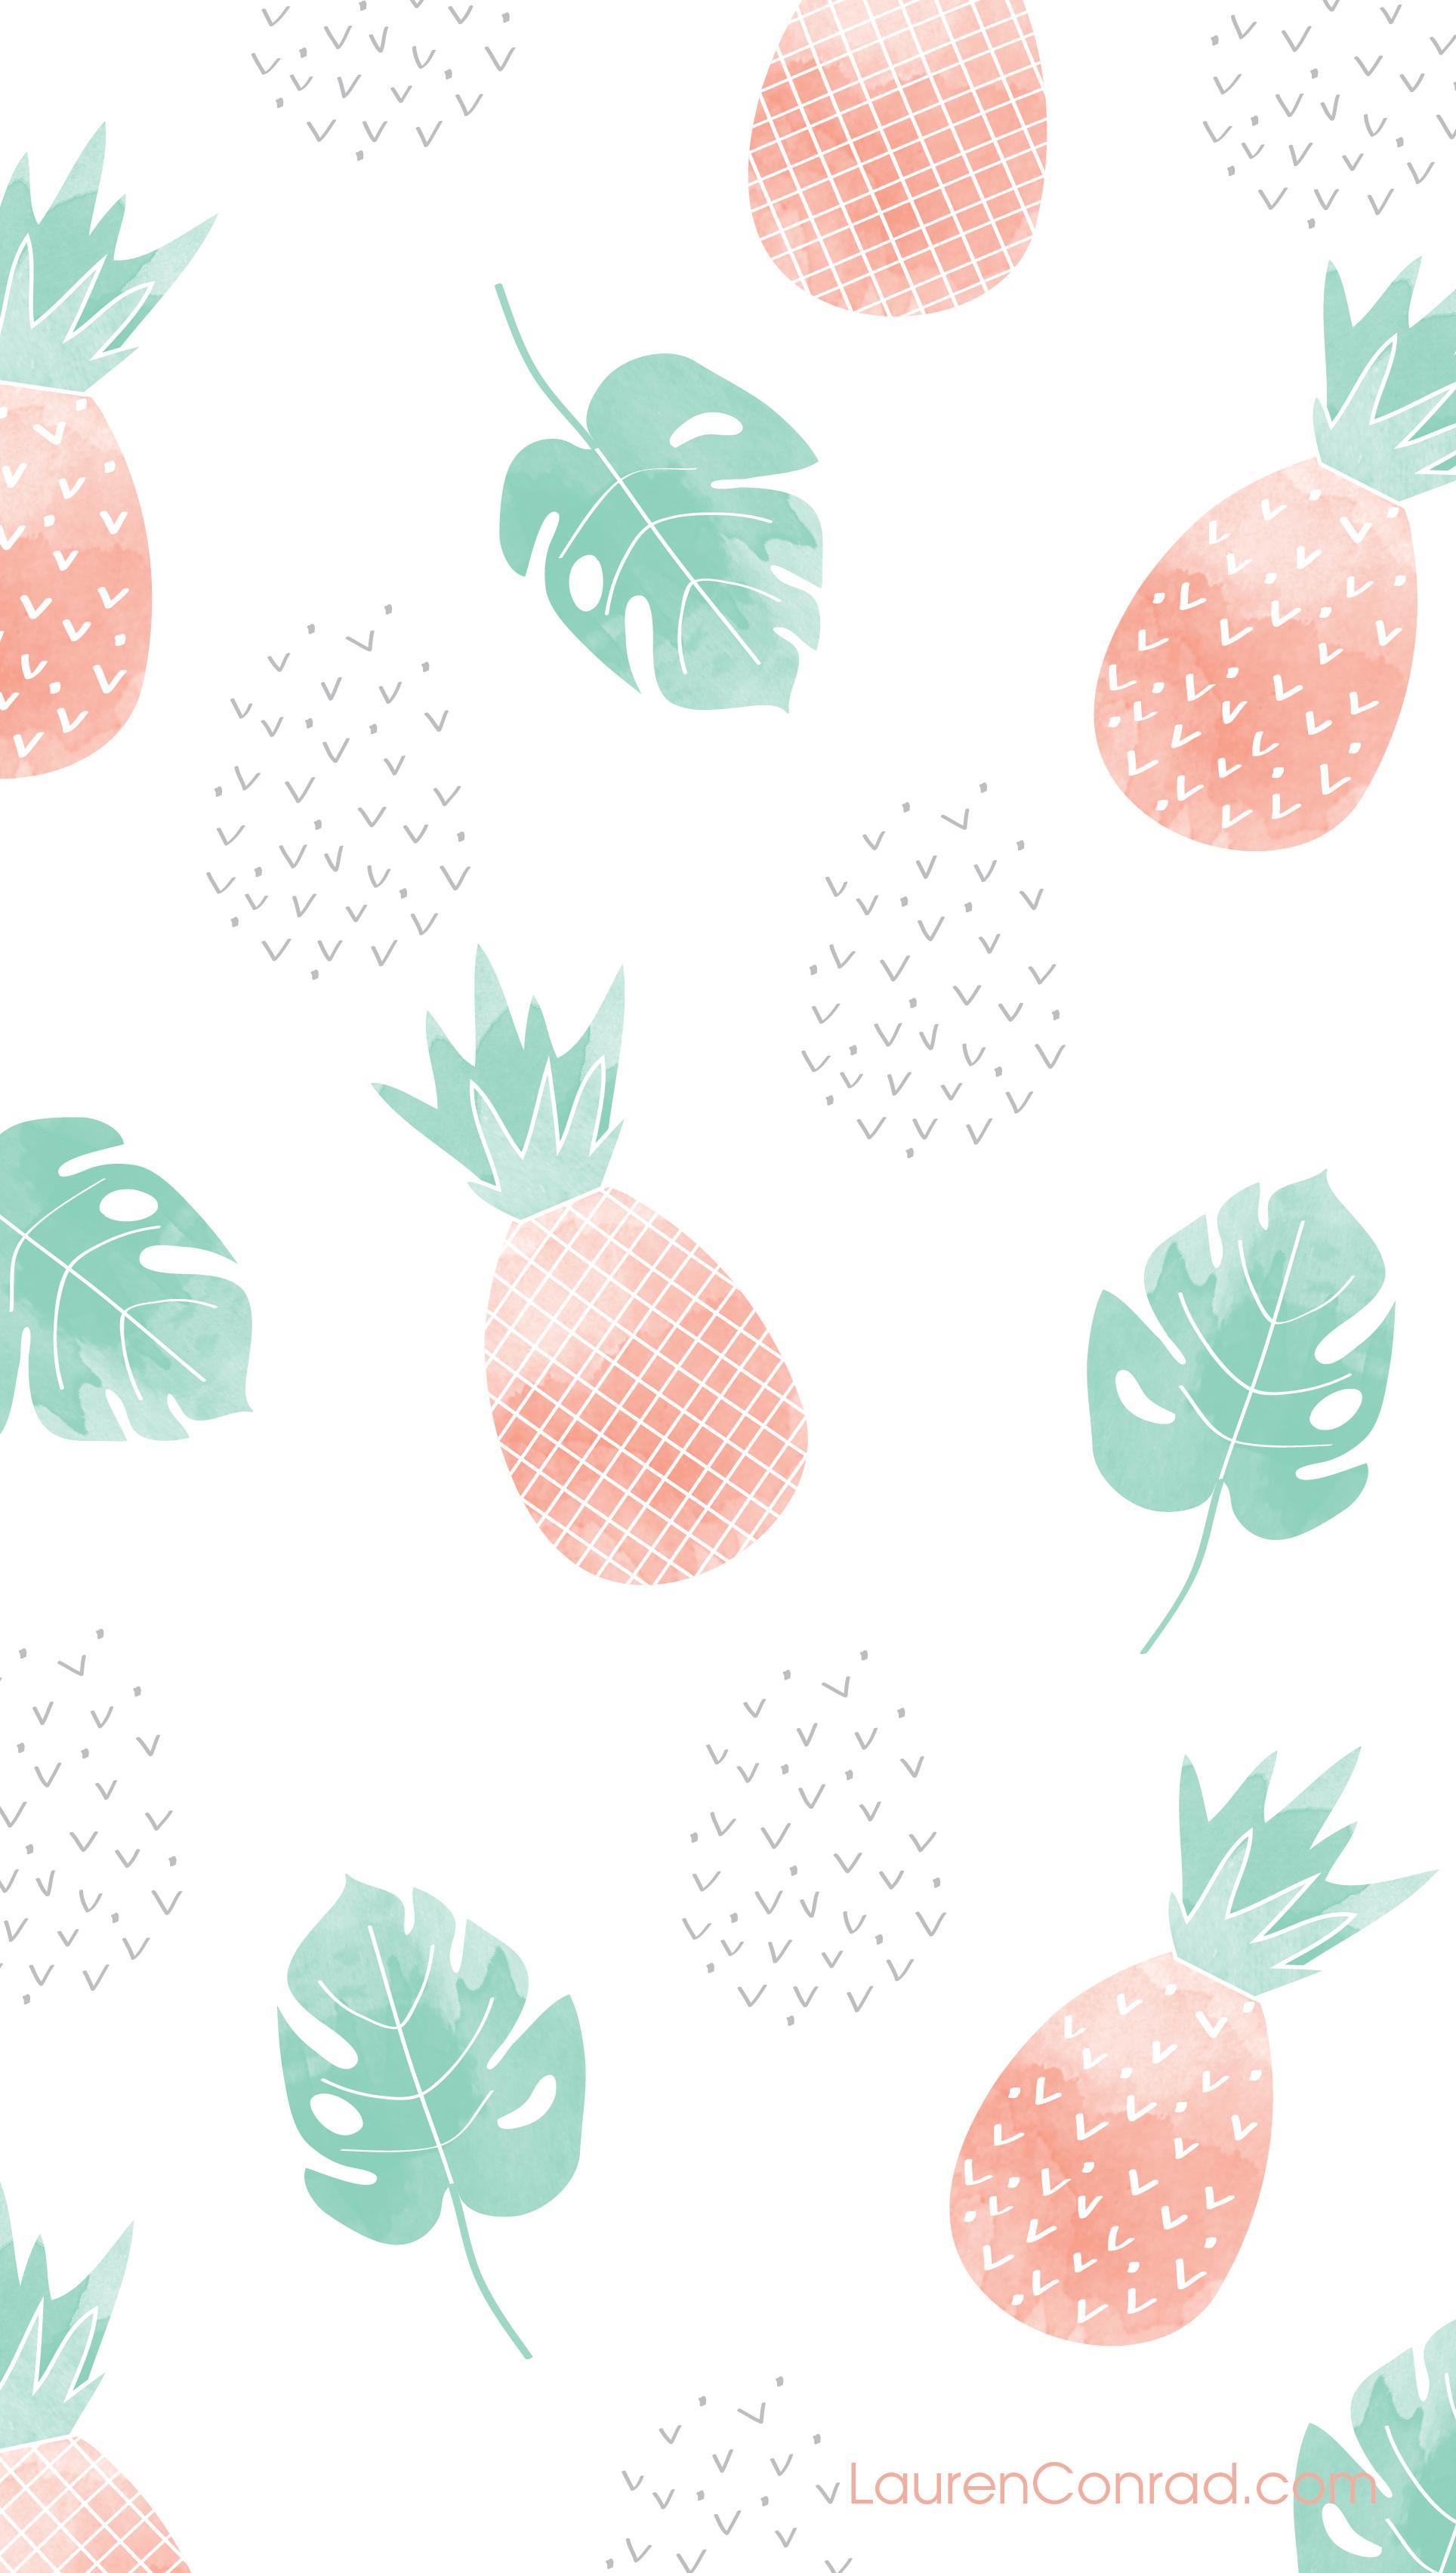 Pineapple clipart wallpaper LC Phone for Wallpaper pixeles